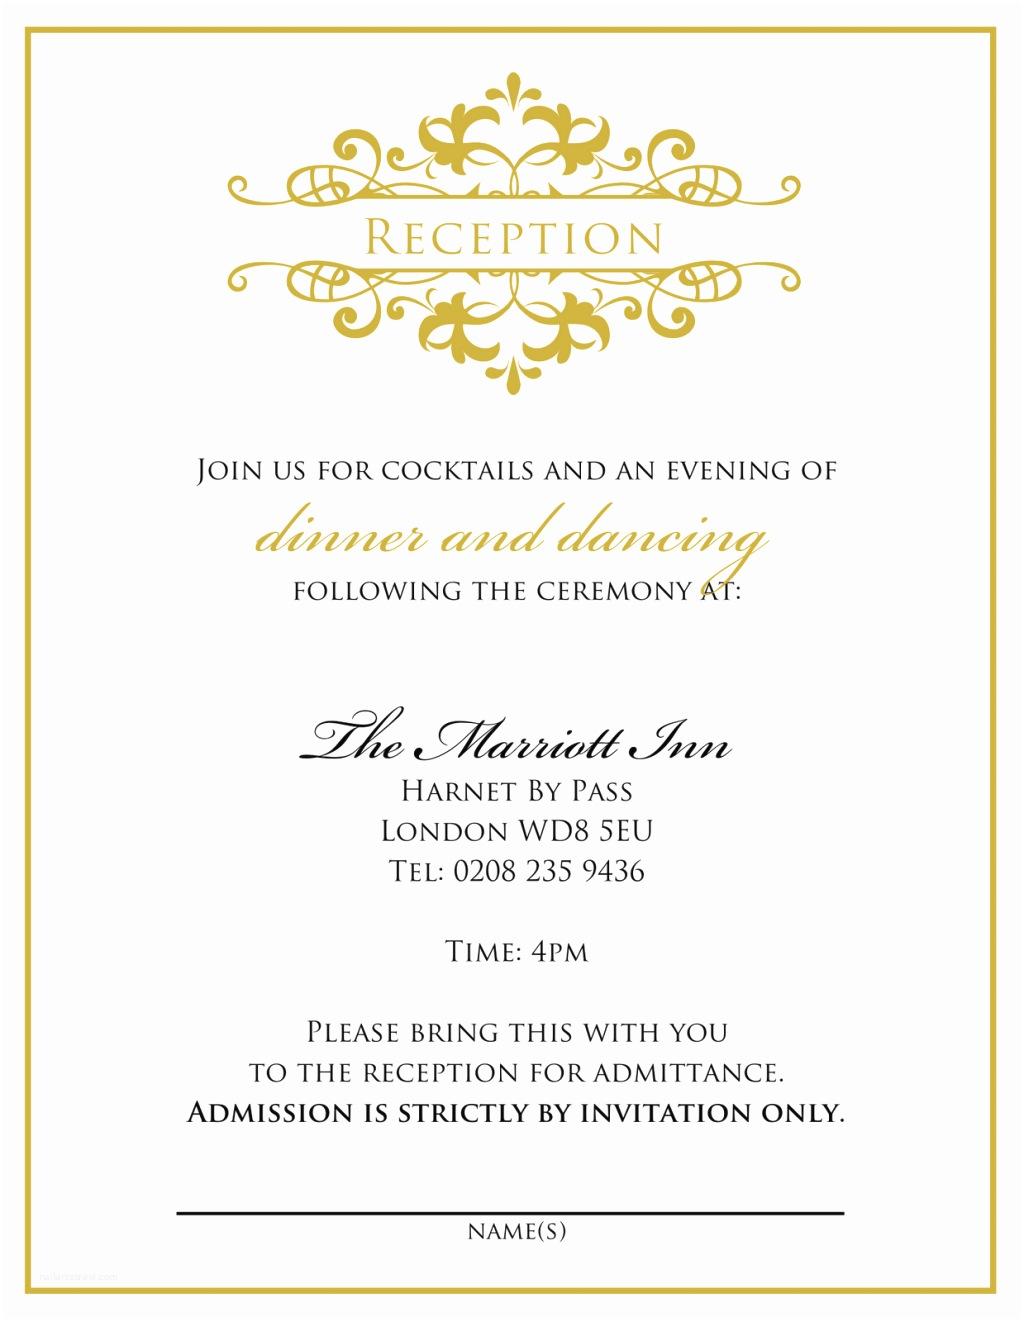 Wedding Invitation Wording Ideas Wedding Invitation Wording From Bride and Groom